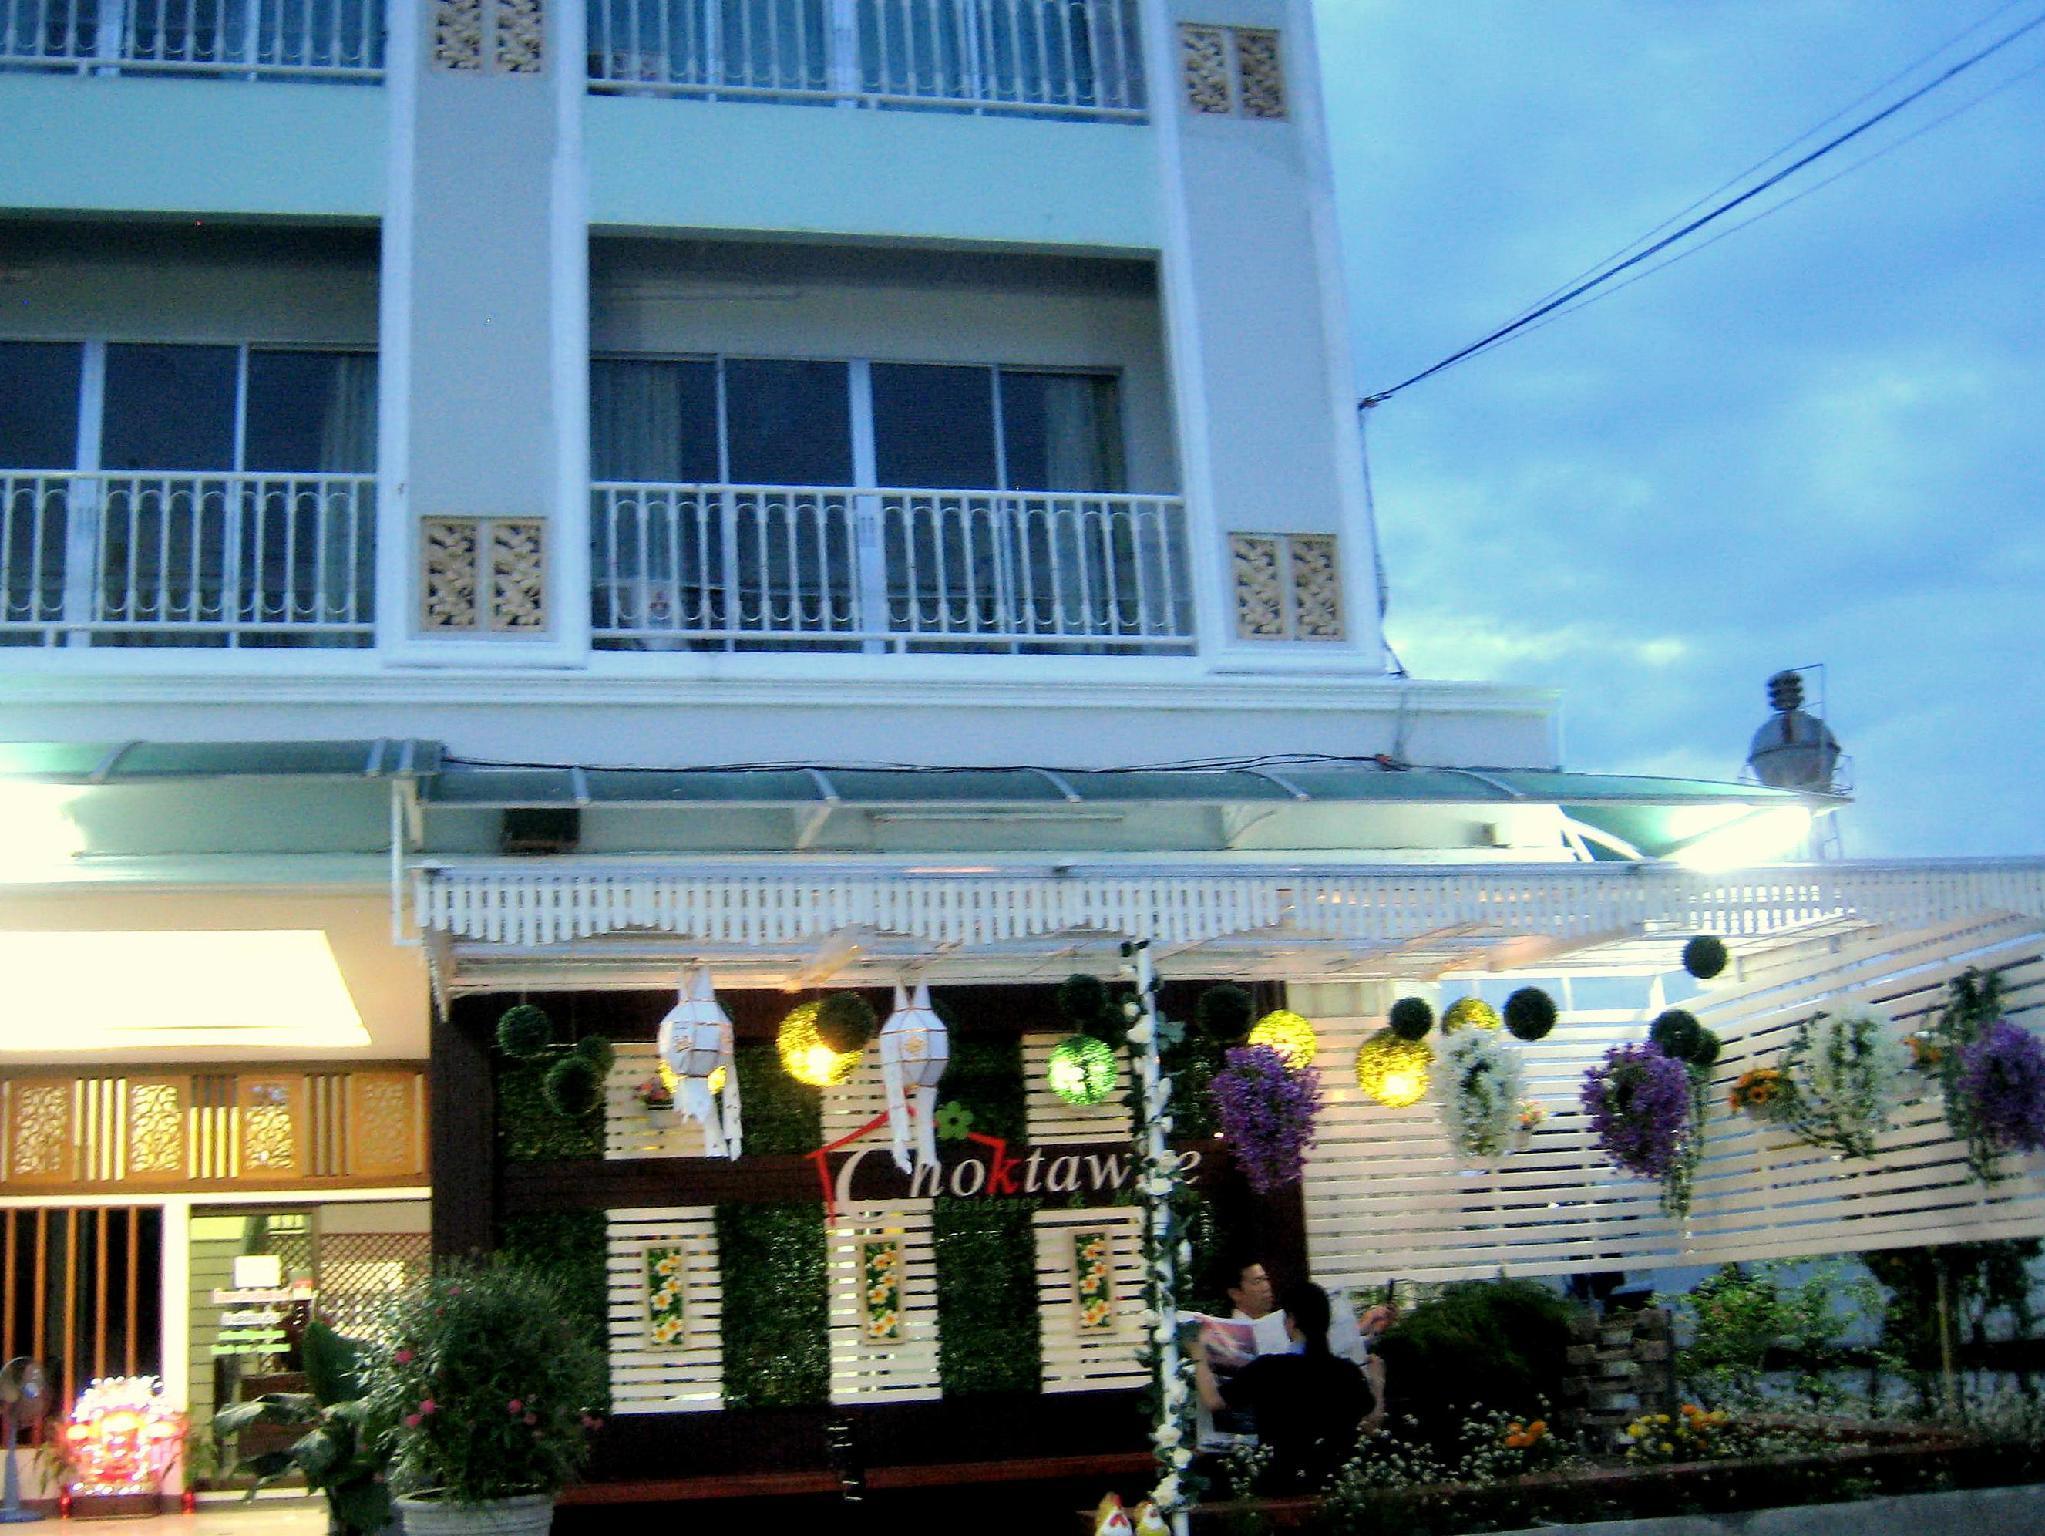 Choktawee Residence and Mansion โชคทวี เรสซิเดนซ์ แอนด์ แมนชั่น